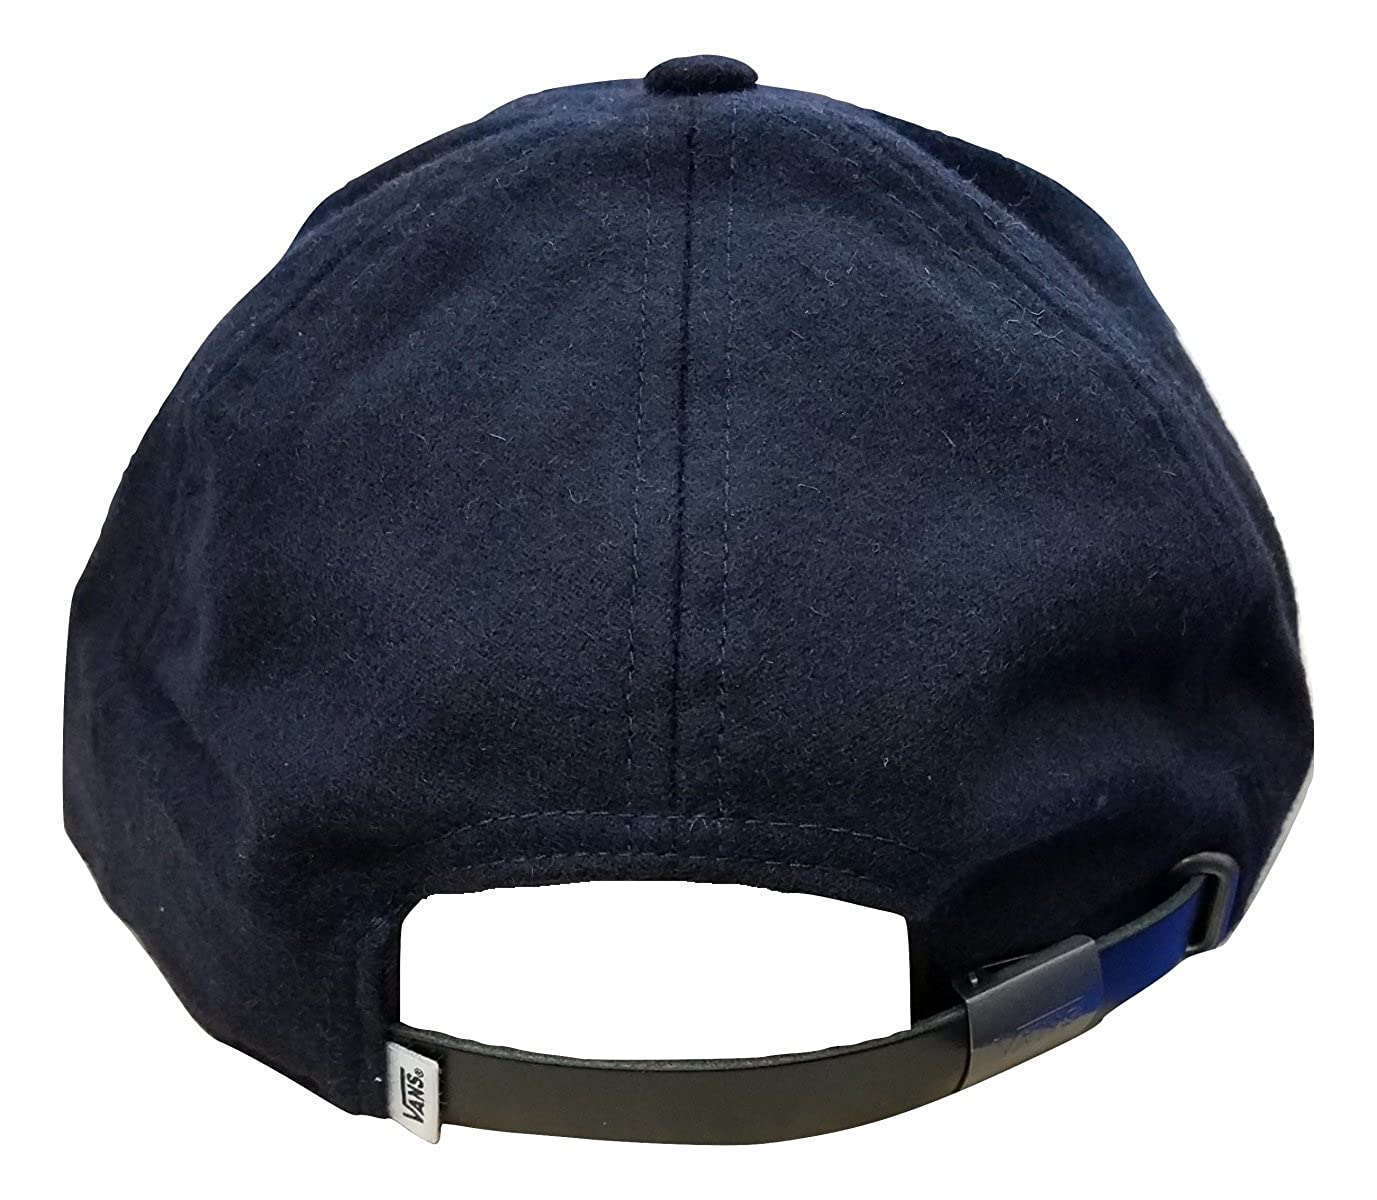 92092da5fbc Vans Men s Women s Dogout Baseball Strap Dad Hat Black College Navy One  Size at Amazon Men s Clothing store